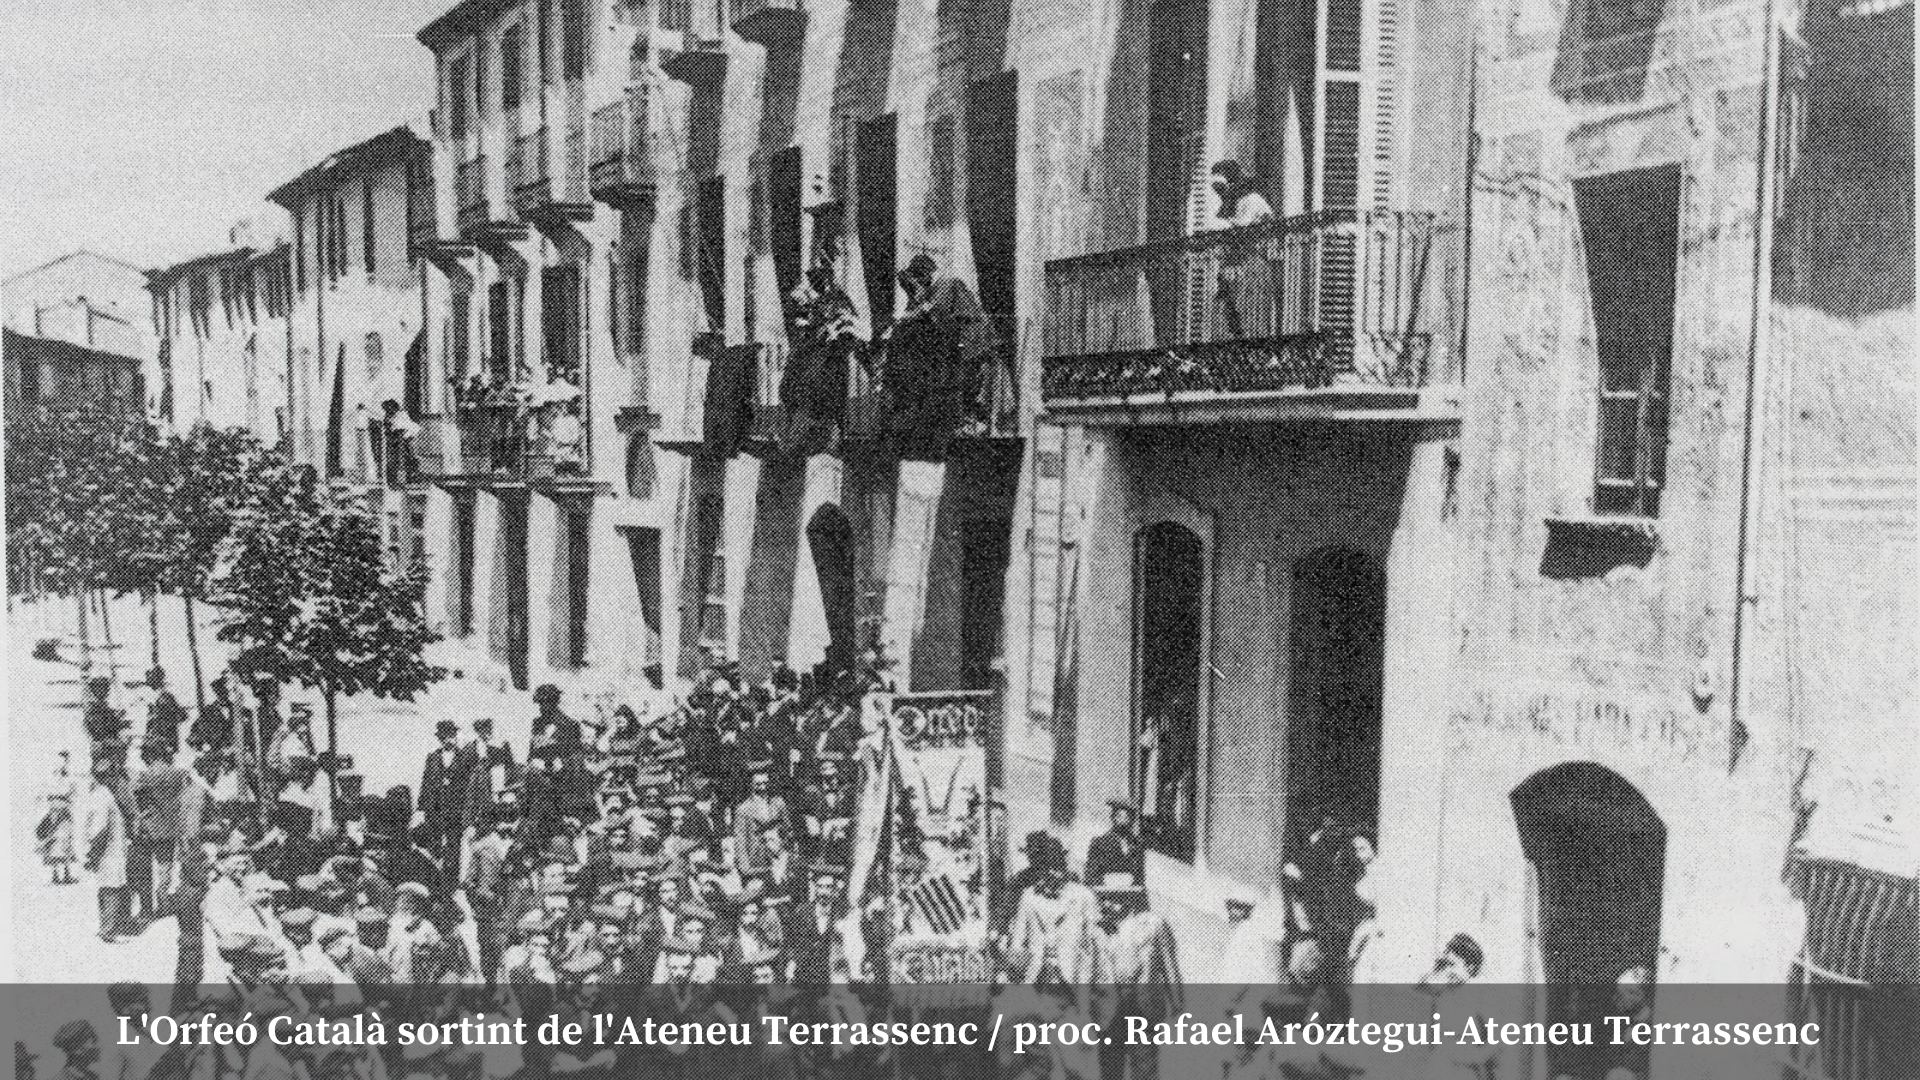 L'Orfeó Català sortint de l'Ateneu Terrassenc / proc. Rafael Aróztegui-Ateneu Terrassenc